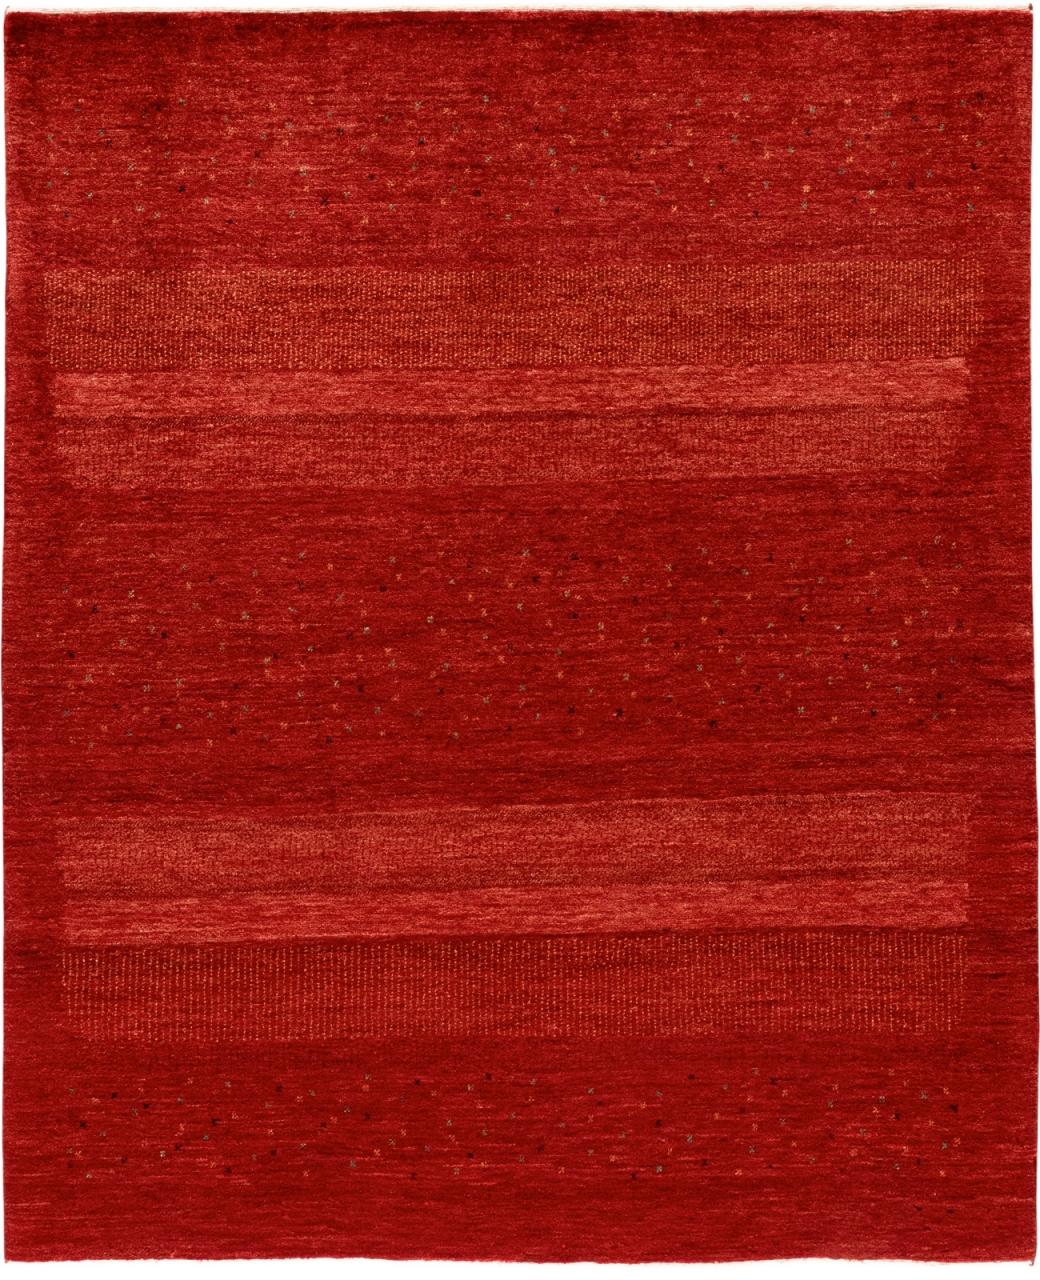 Iran Gabbeh Teppich-Unikat Redstone